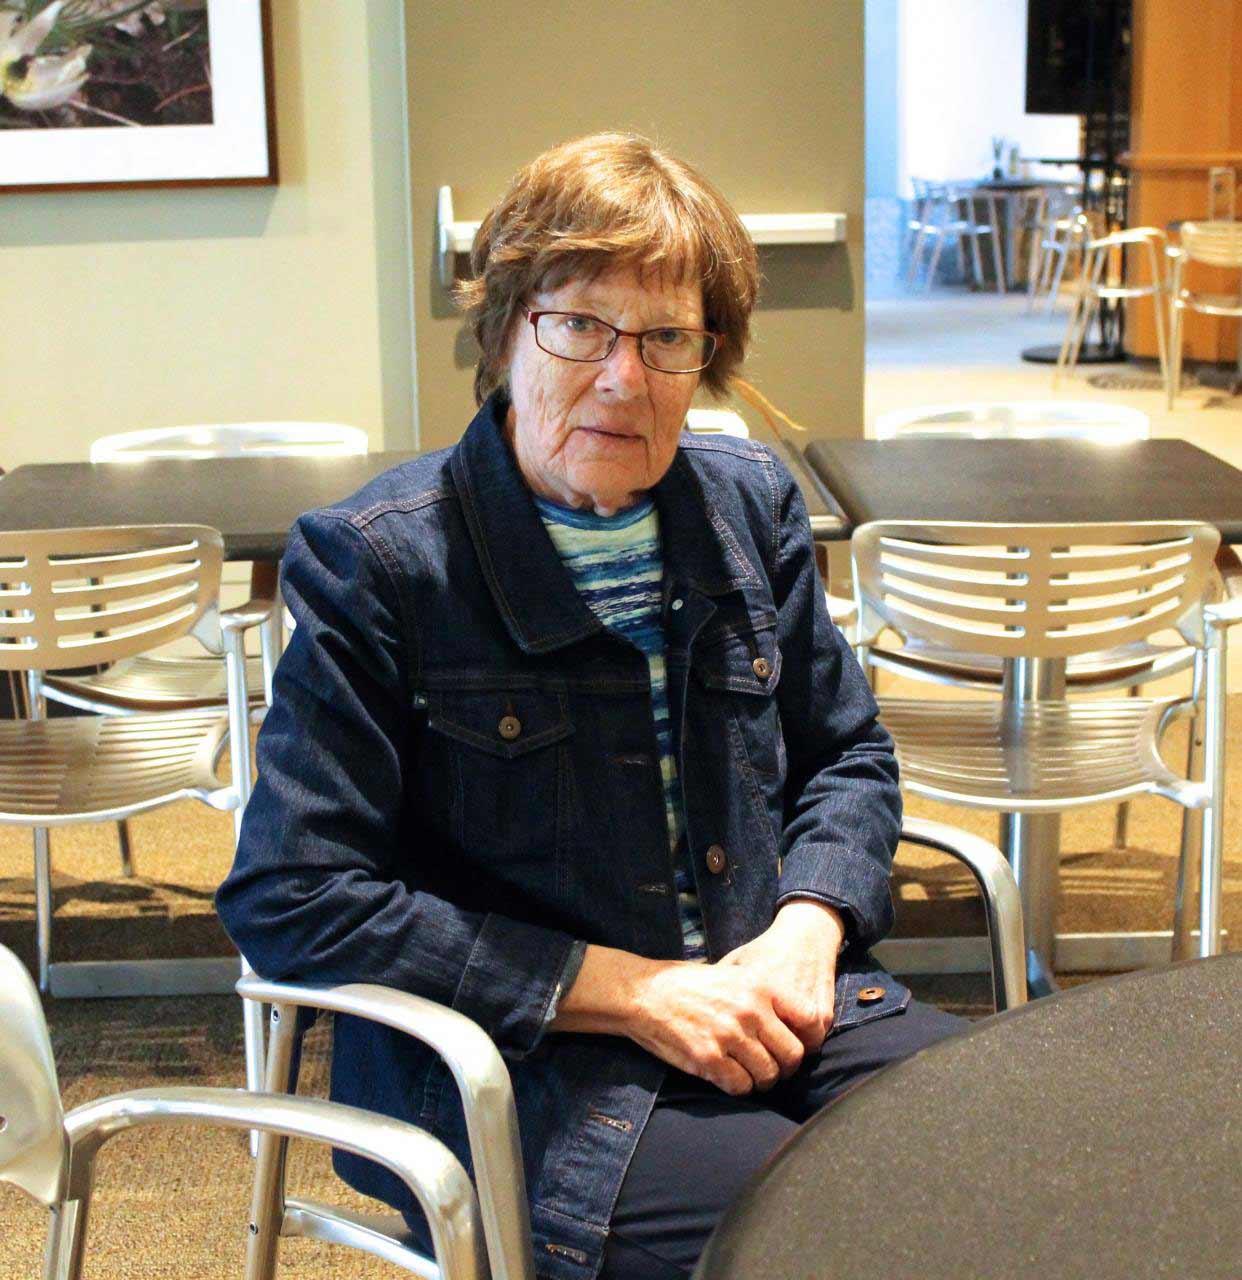 Kathy Matson transferred 3,783 files for SHPO